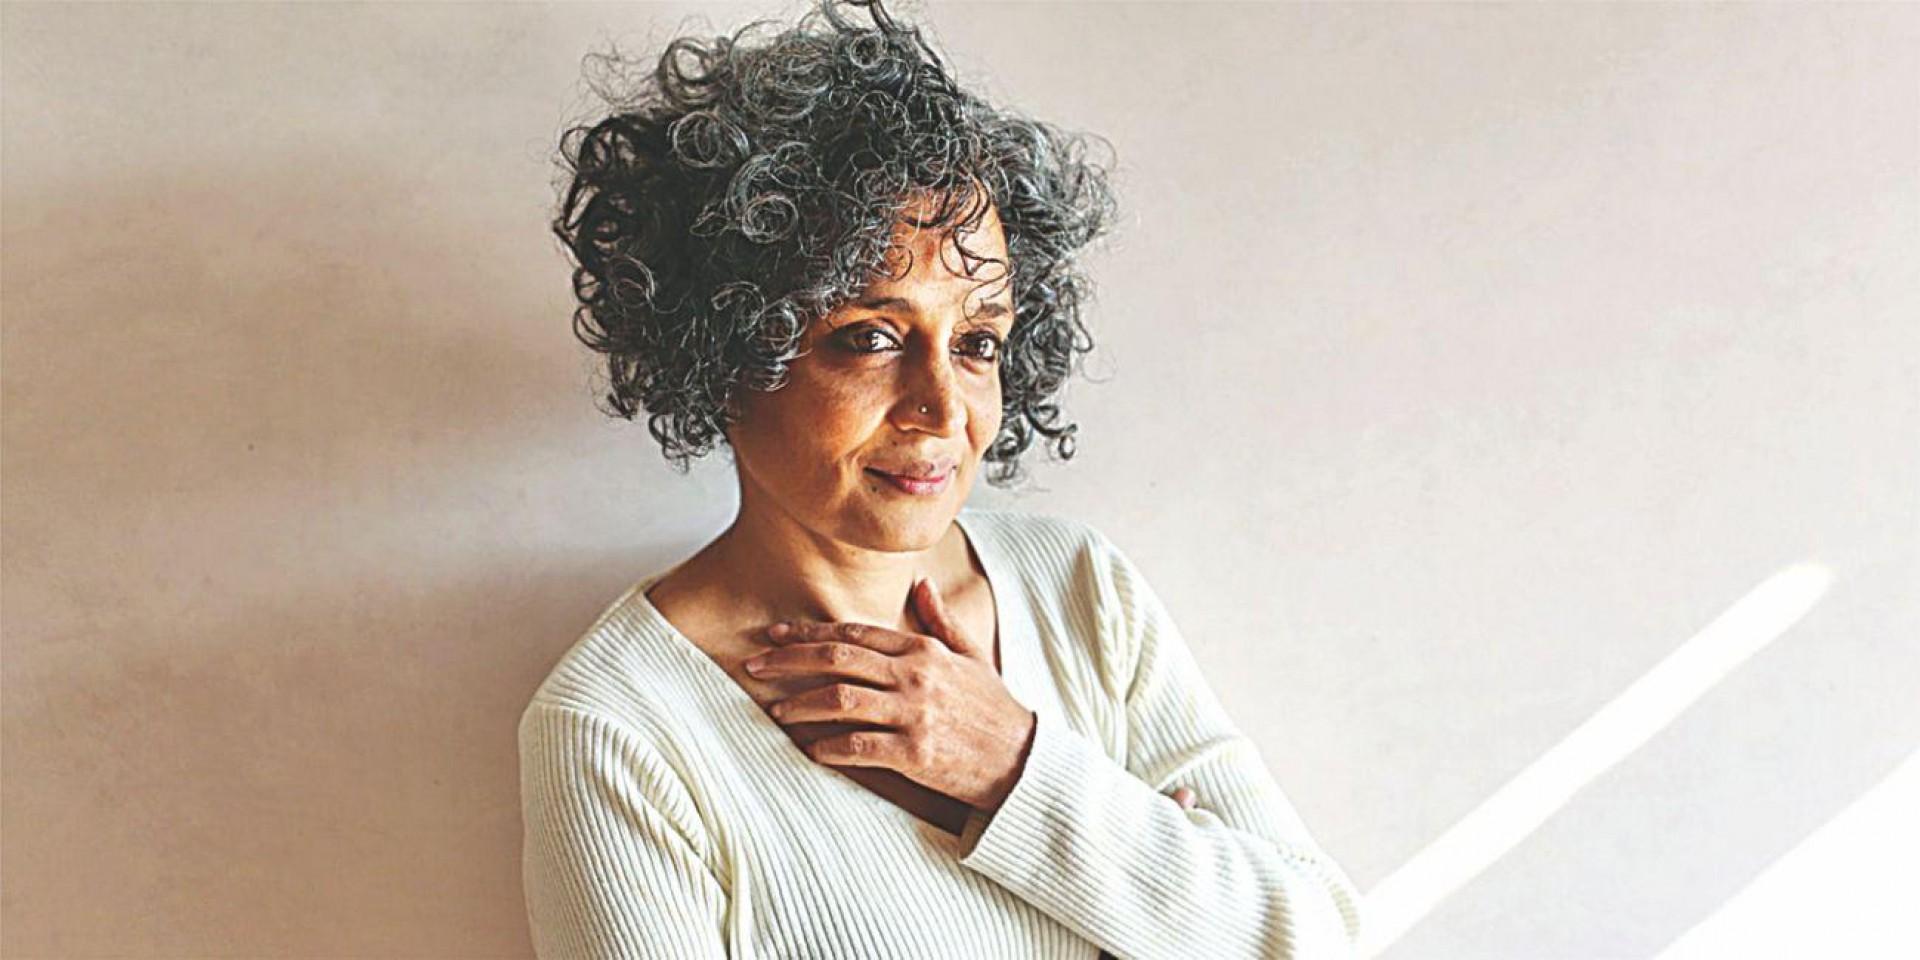 014 Essays By Arundhati Roy Essay Example 3itokq1g1y8kl Sensational 1920